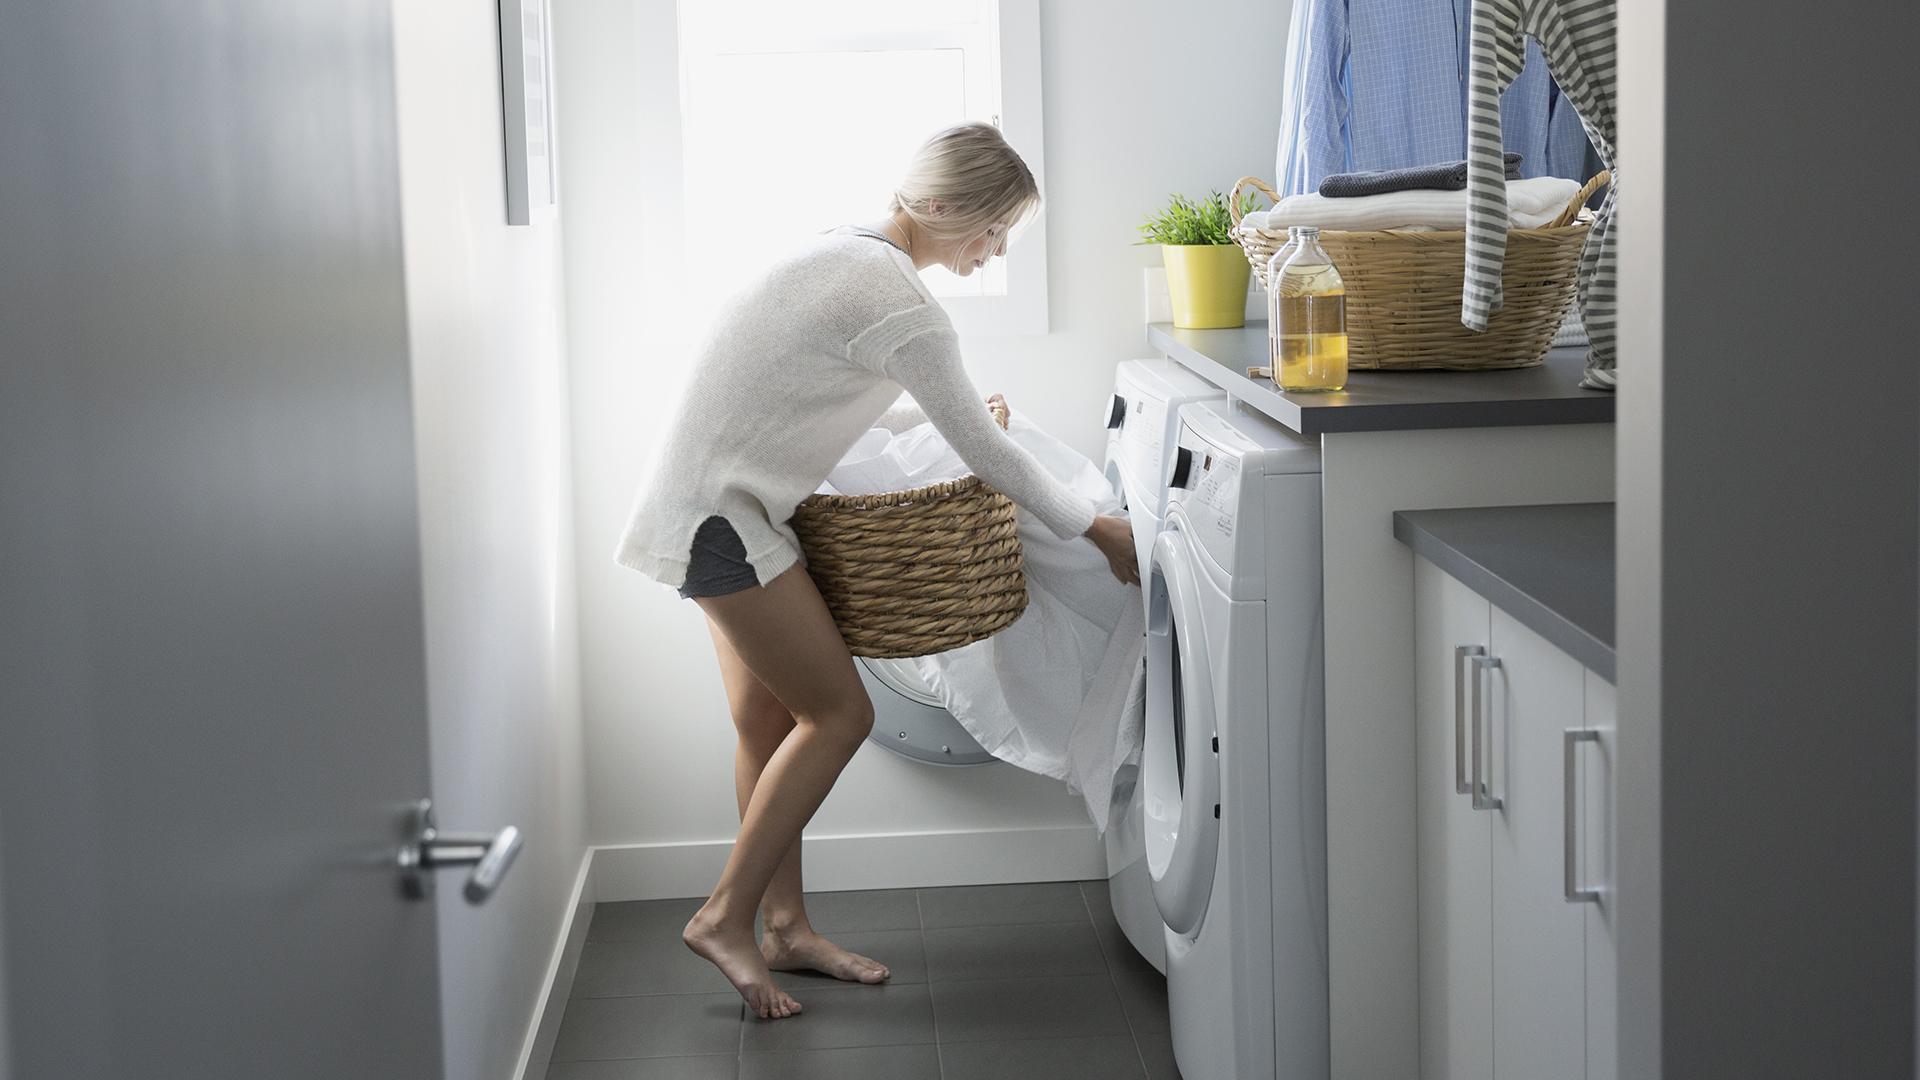 Cuci sprei bekas ngompol bayi